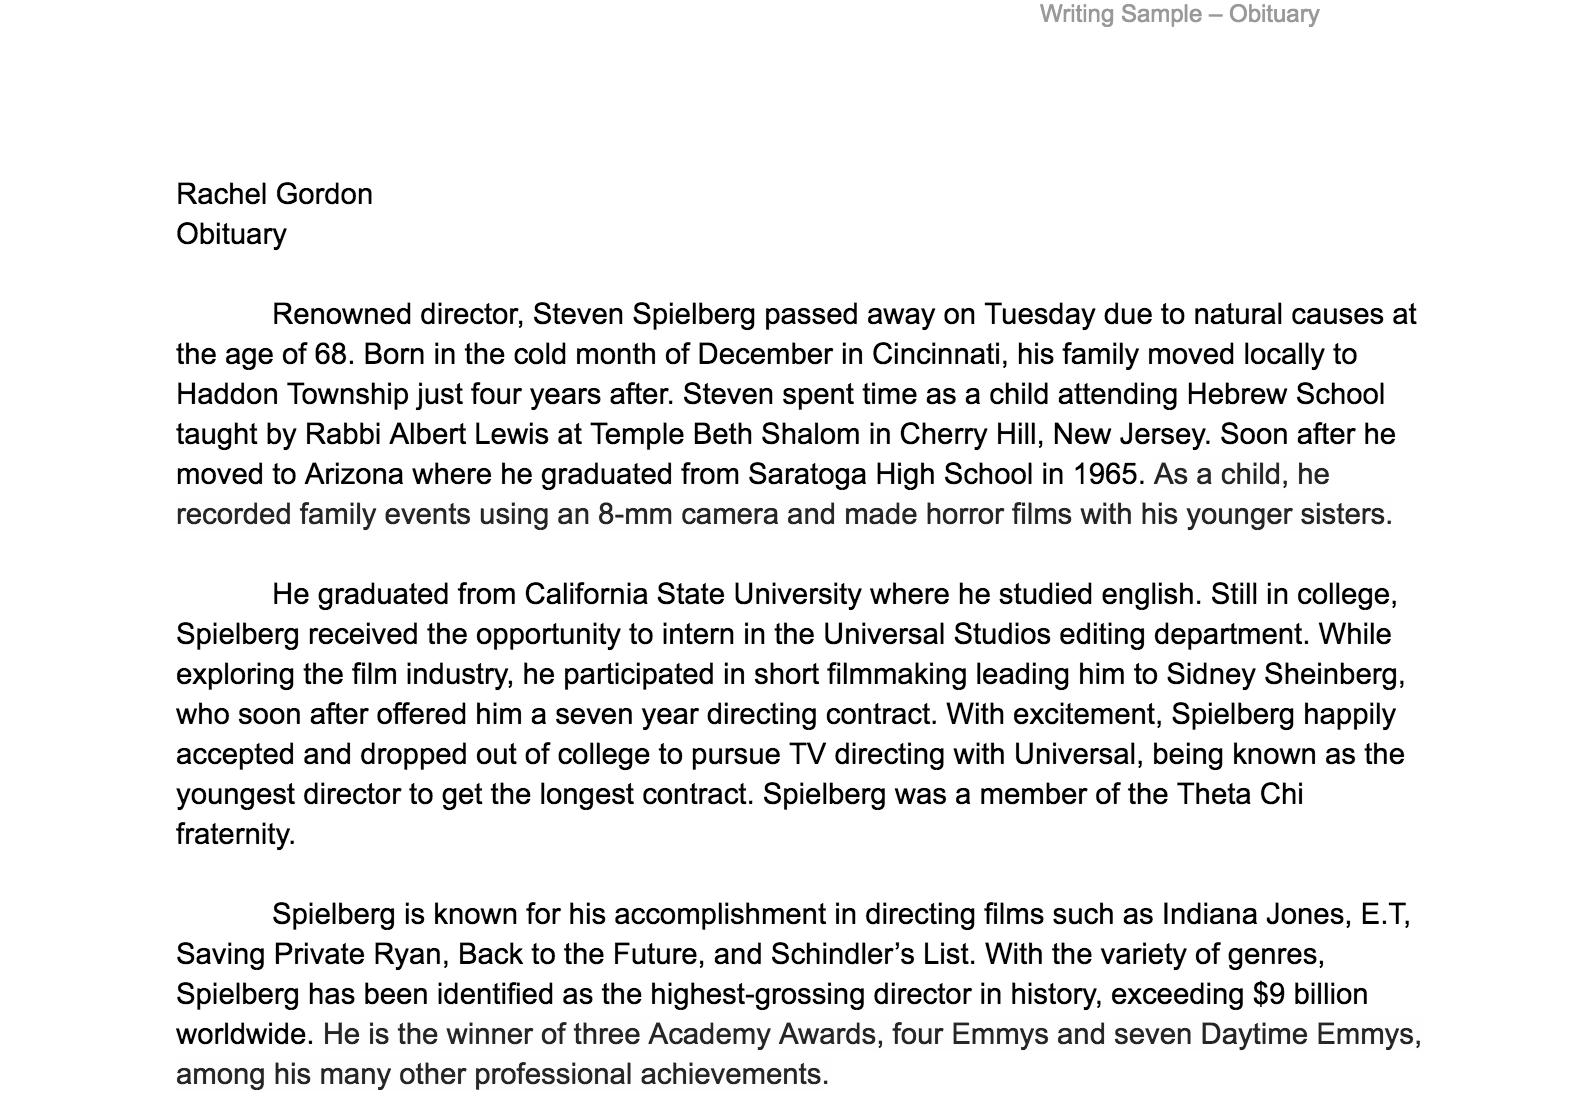 Writing Sample: Obituary